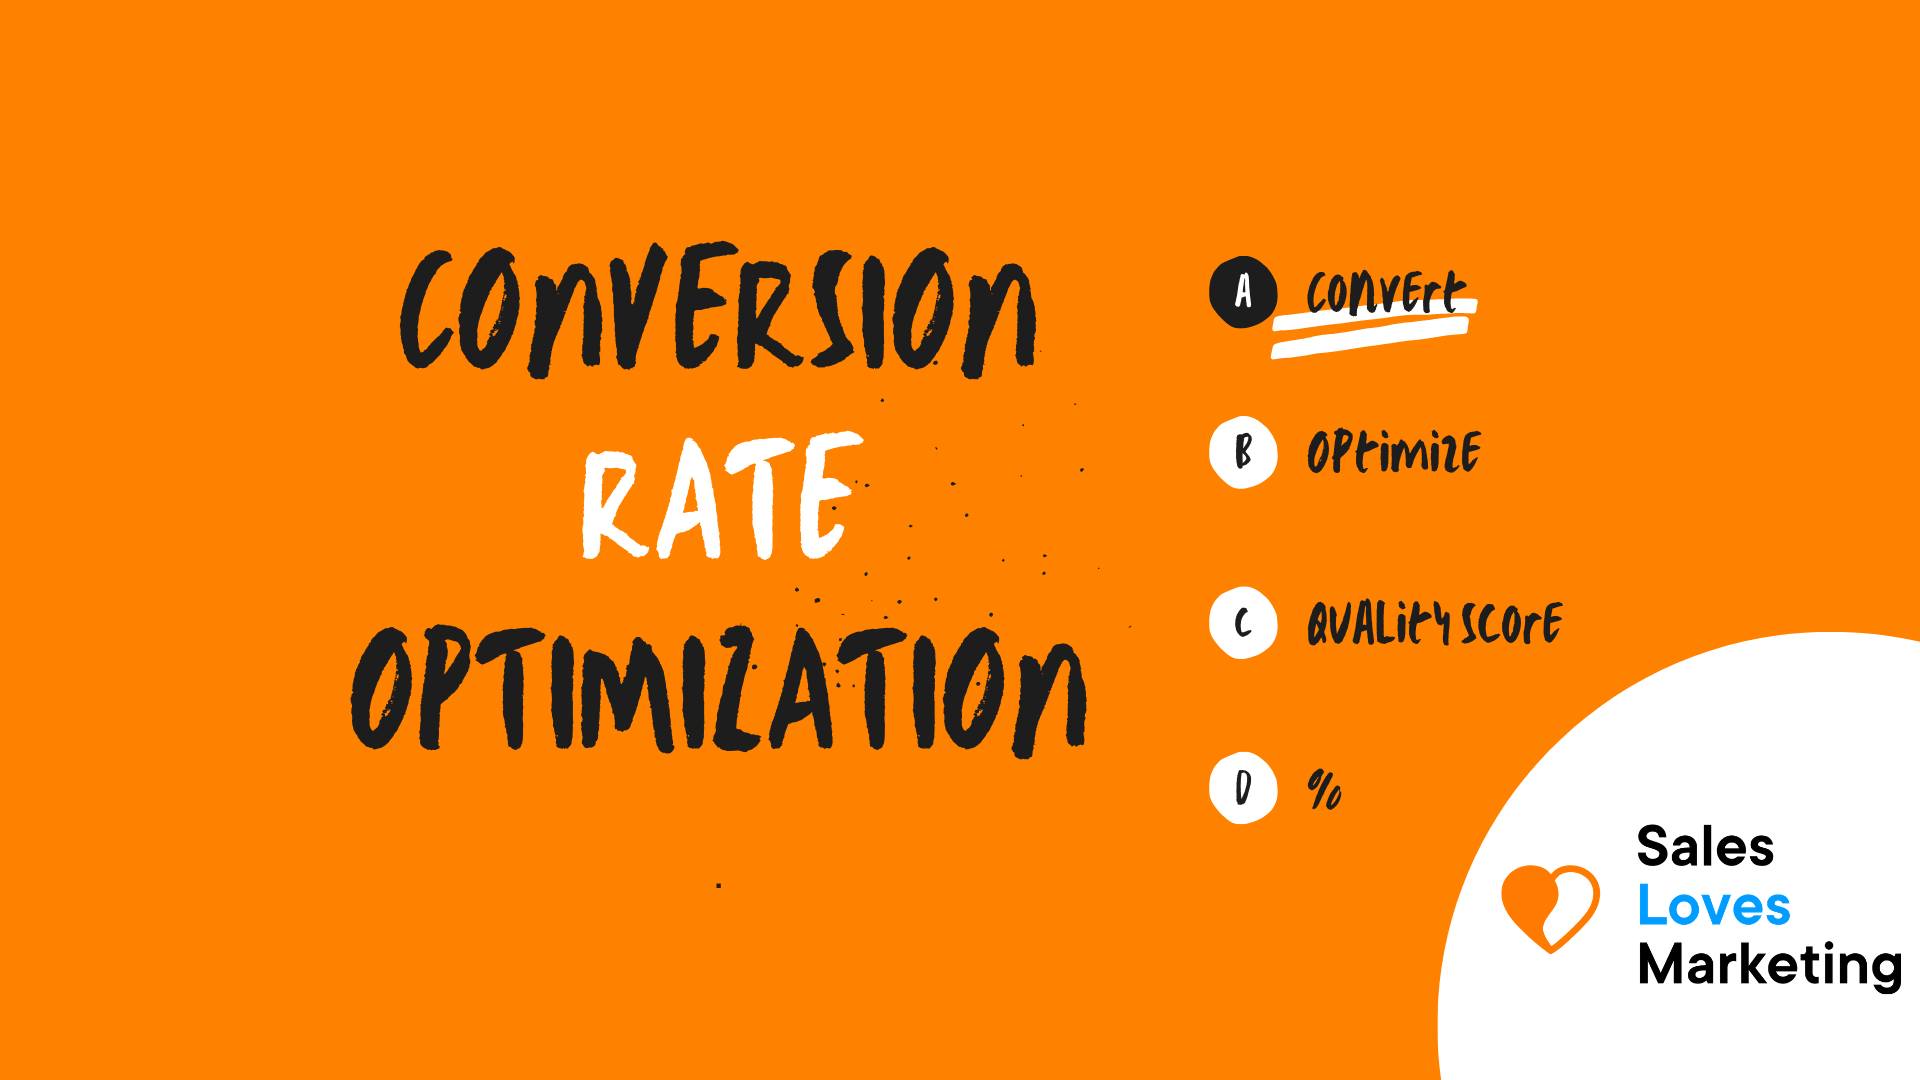 Conversion Rate Optimization (CRO)